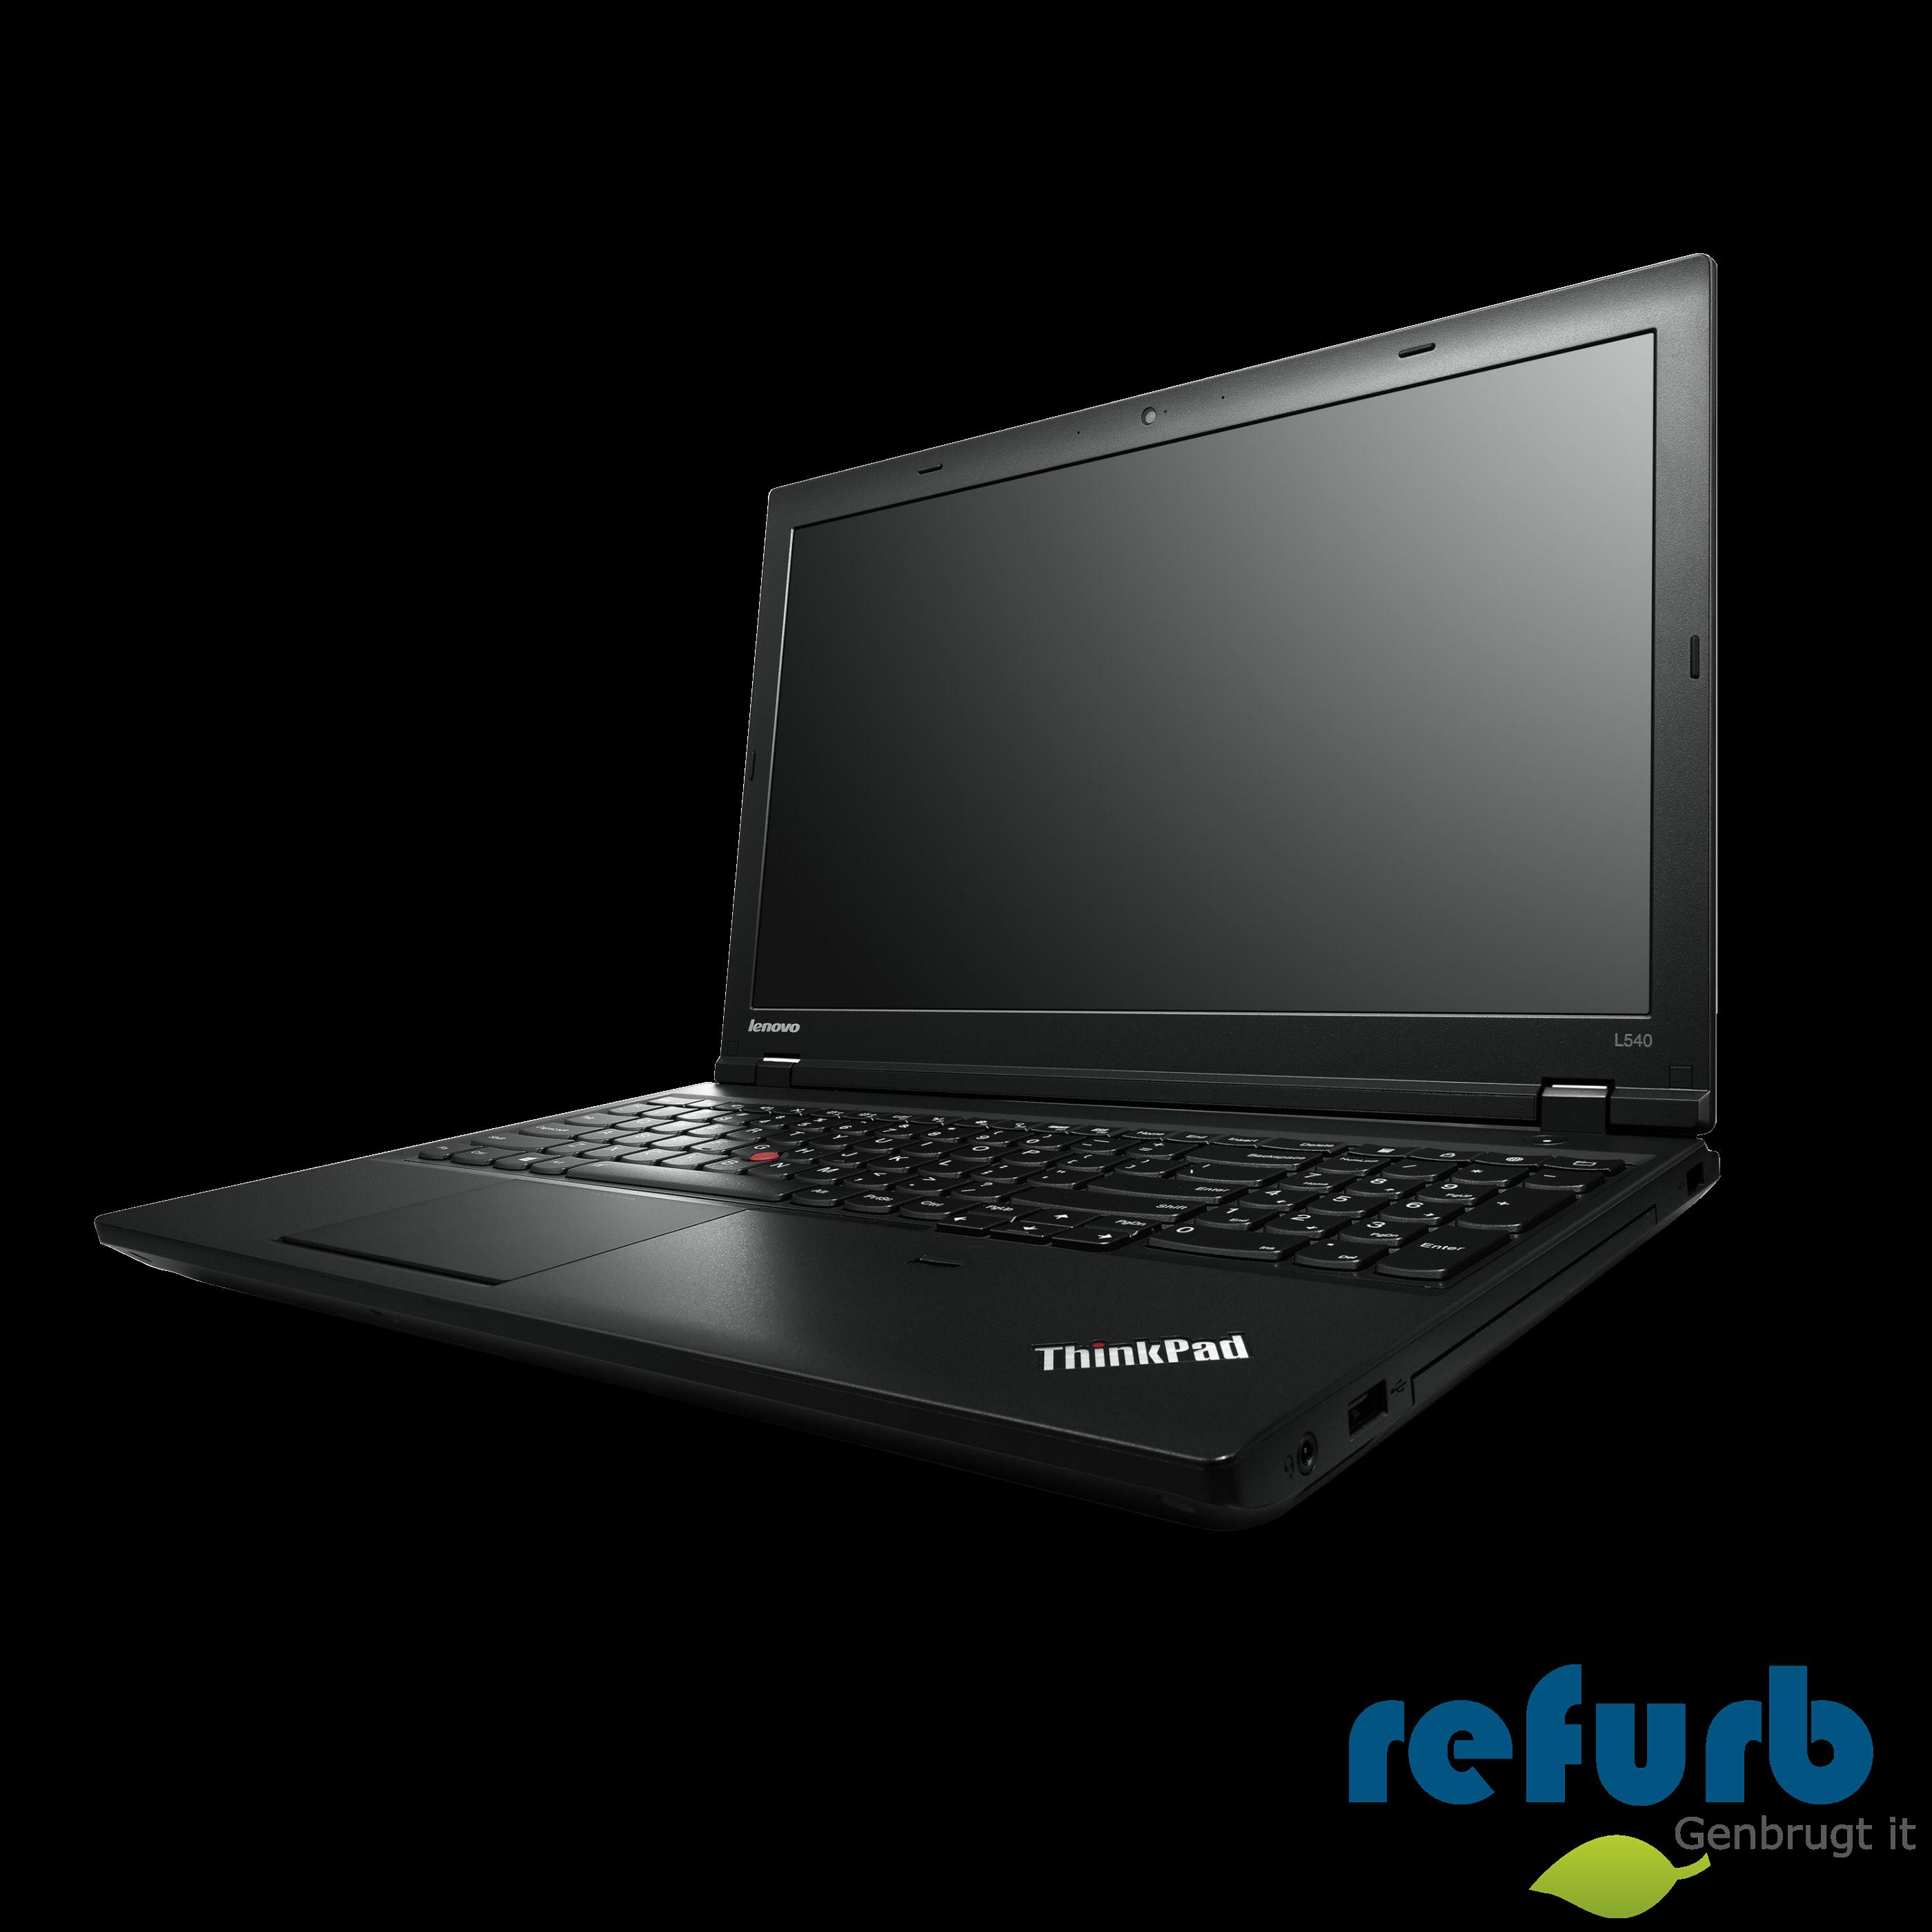 Lenovo Lenovo thinkpad l540 fra refurb